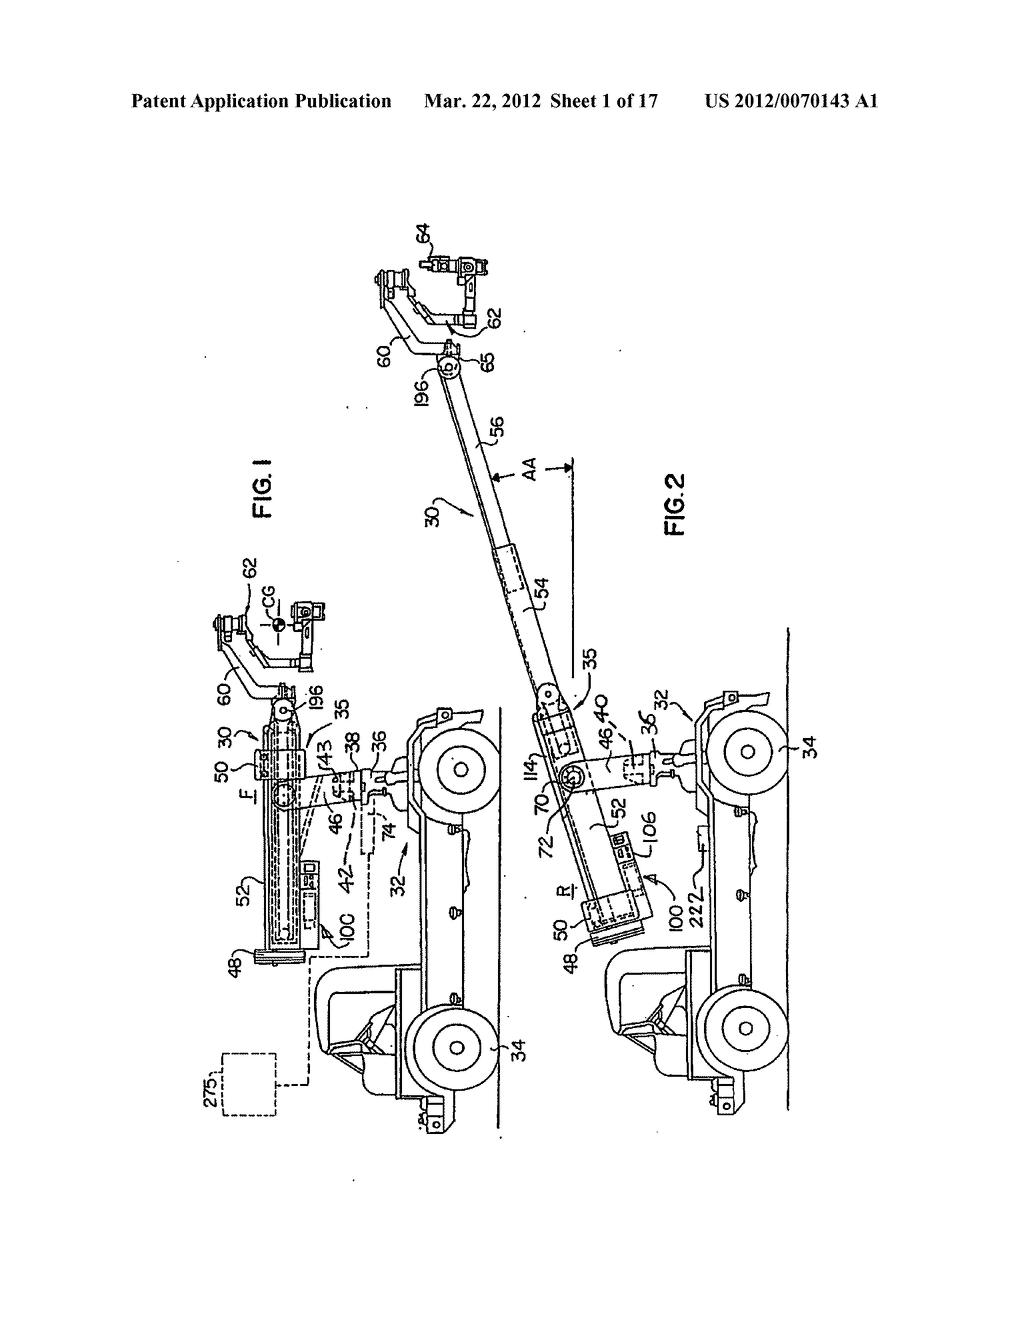 hydraulic stop valve for a camera crane diagram schematic and rh patentsencyclopedia com crane schematic minecraft crane chemical pumps